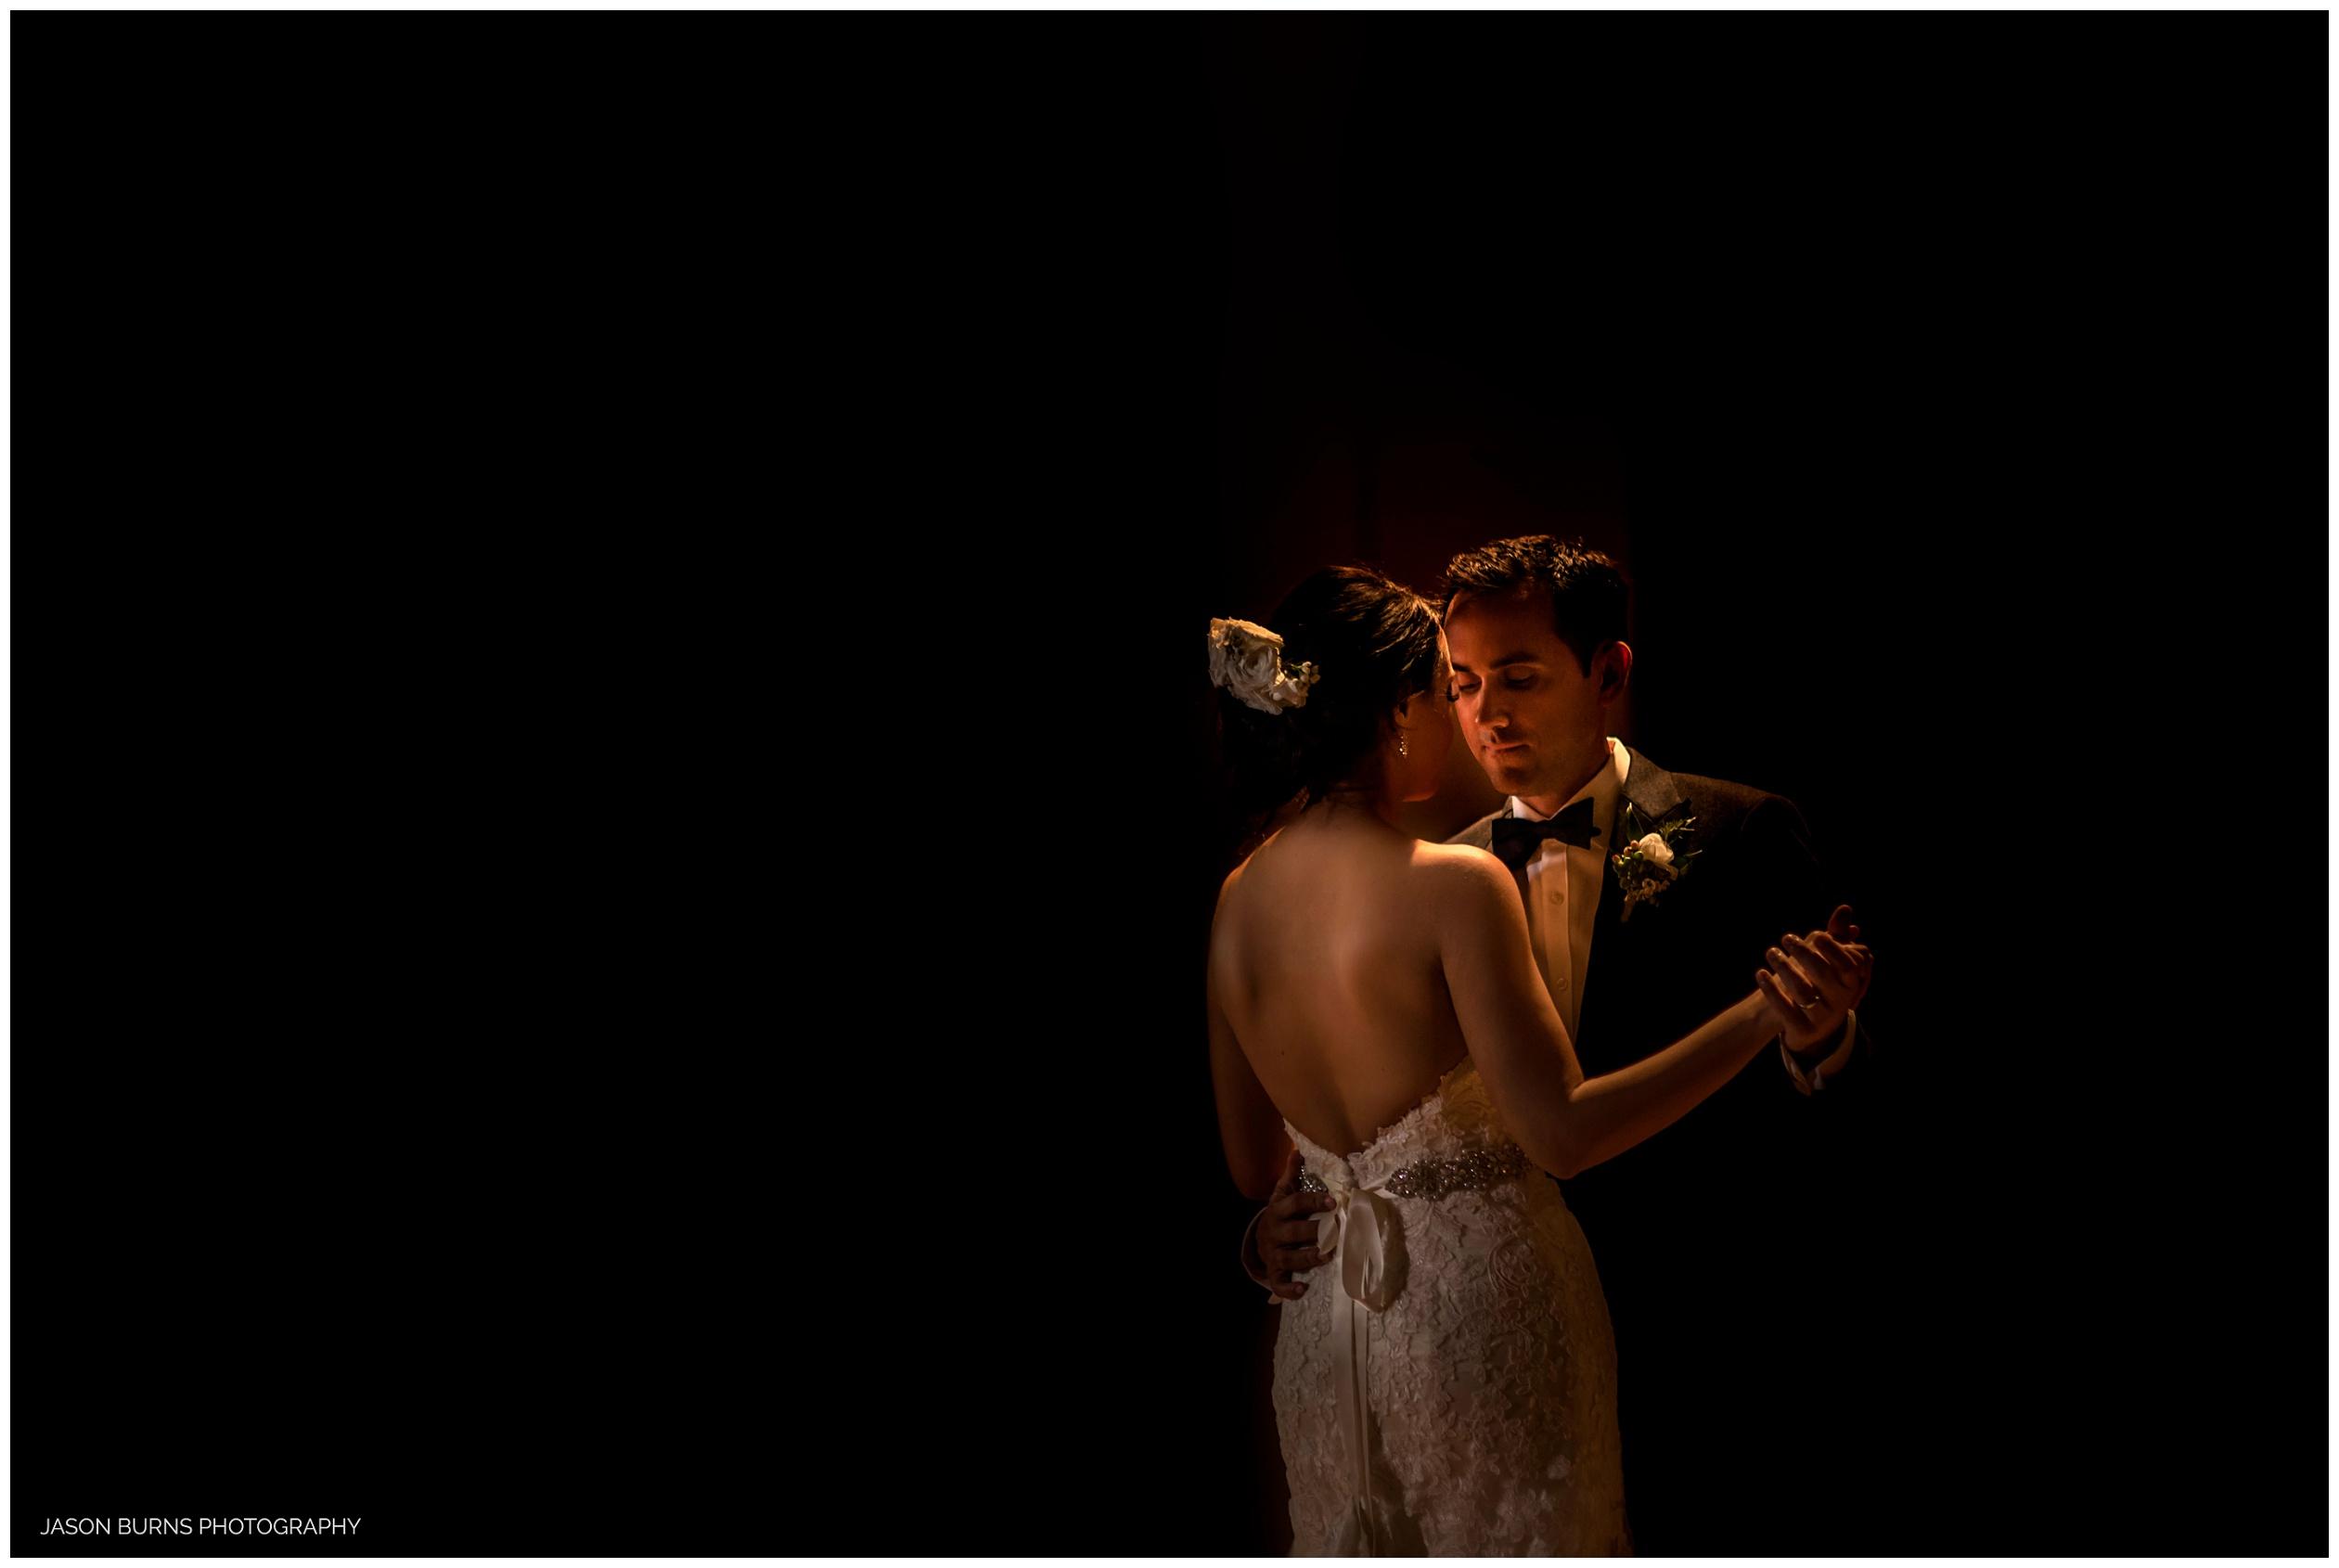 Bride and Groom First Dance at The Hacienda Weddings Santa Ana, CA